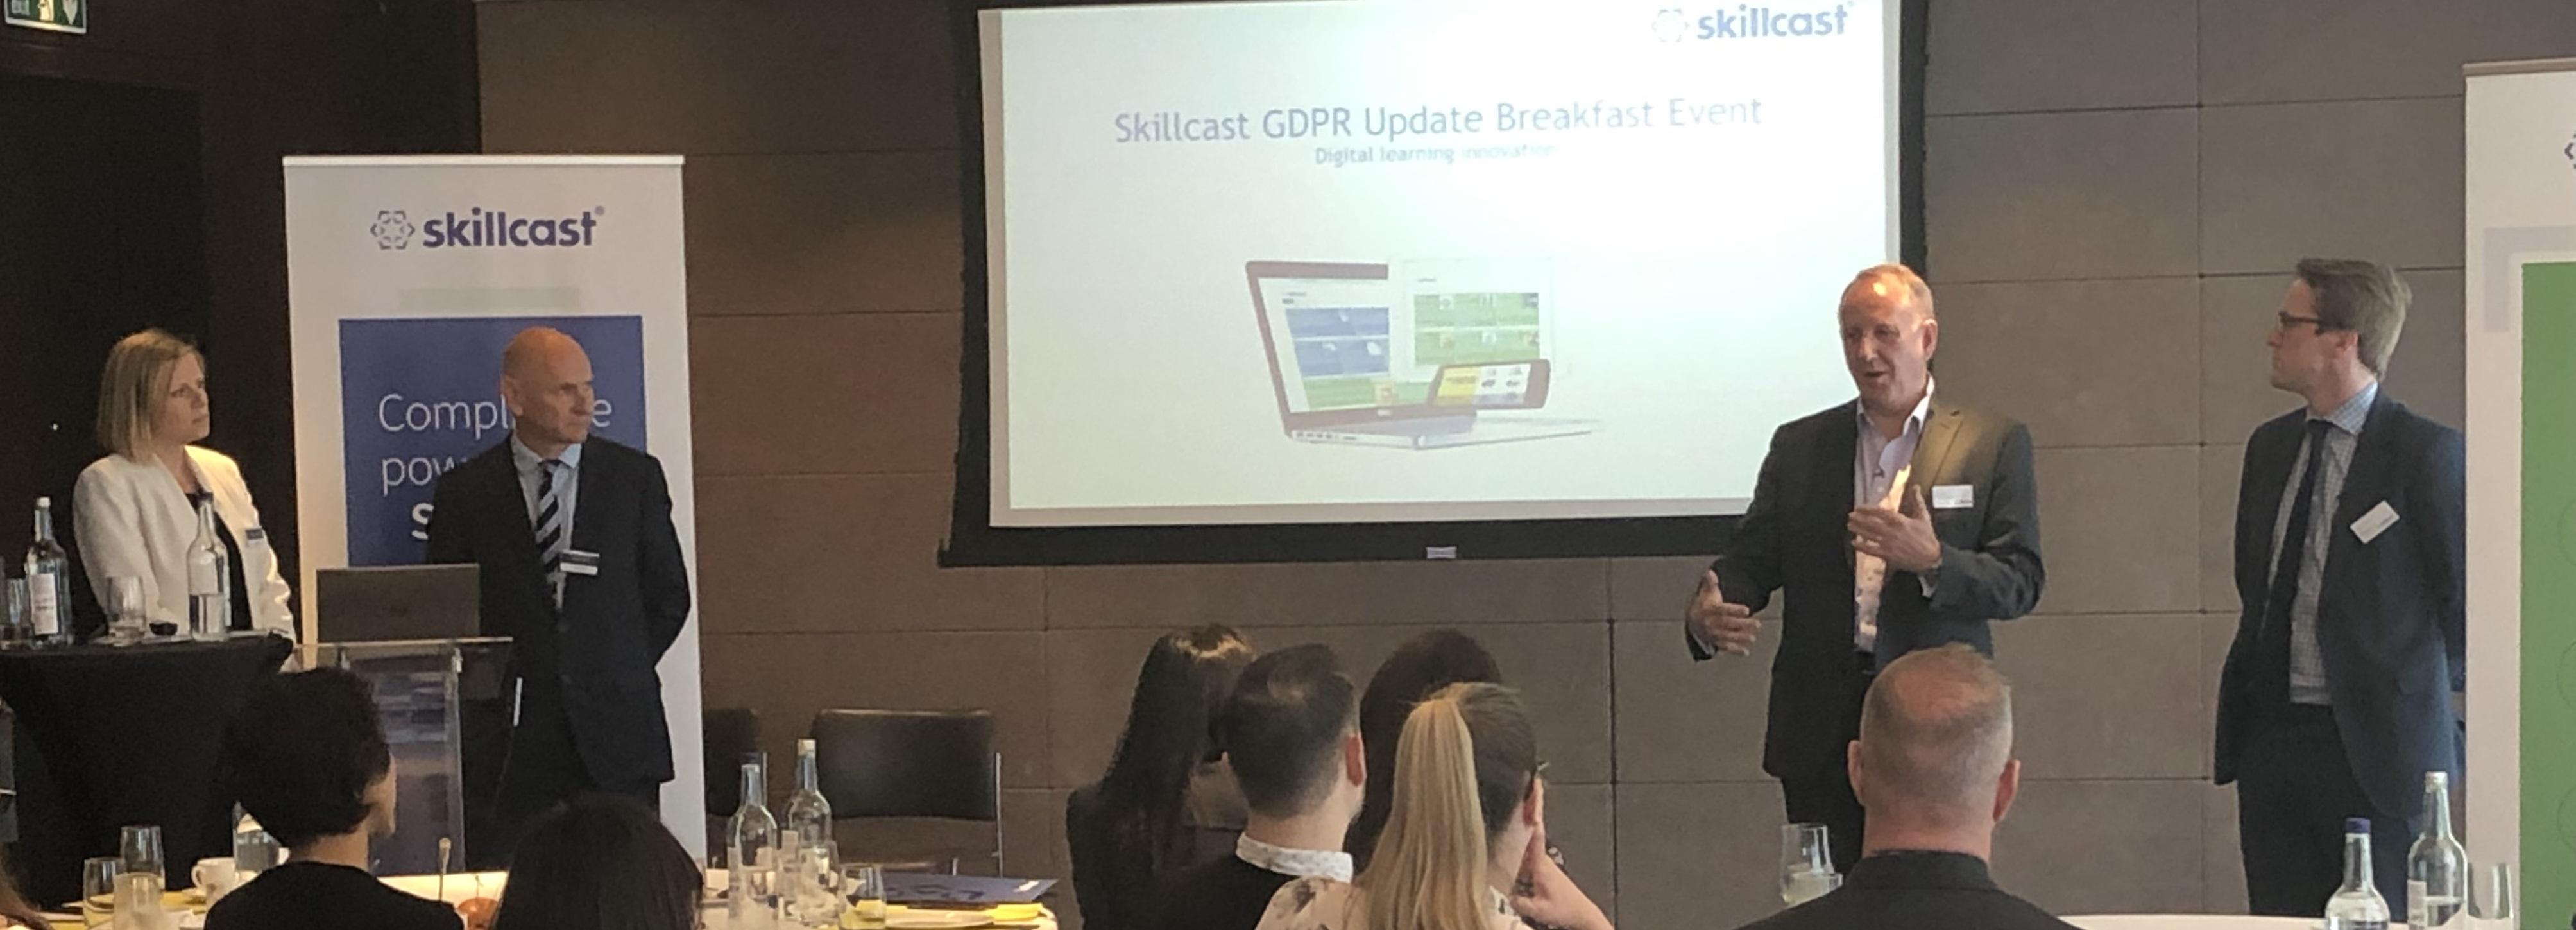 Skillcast_GDPR_event